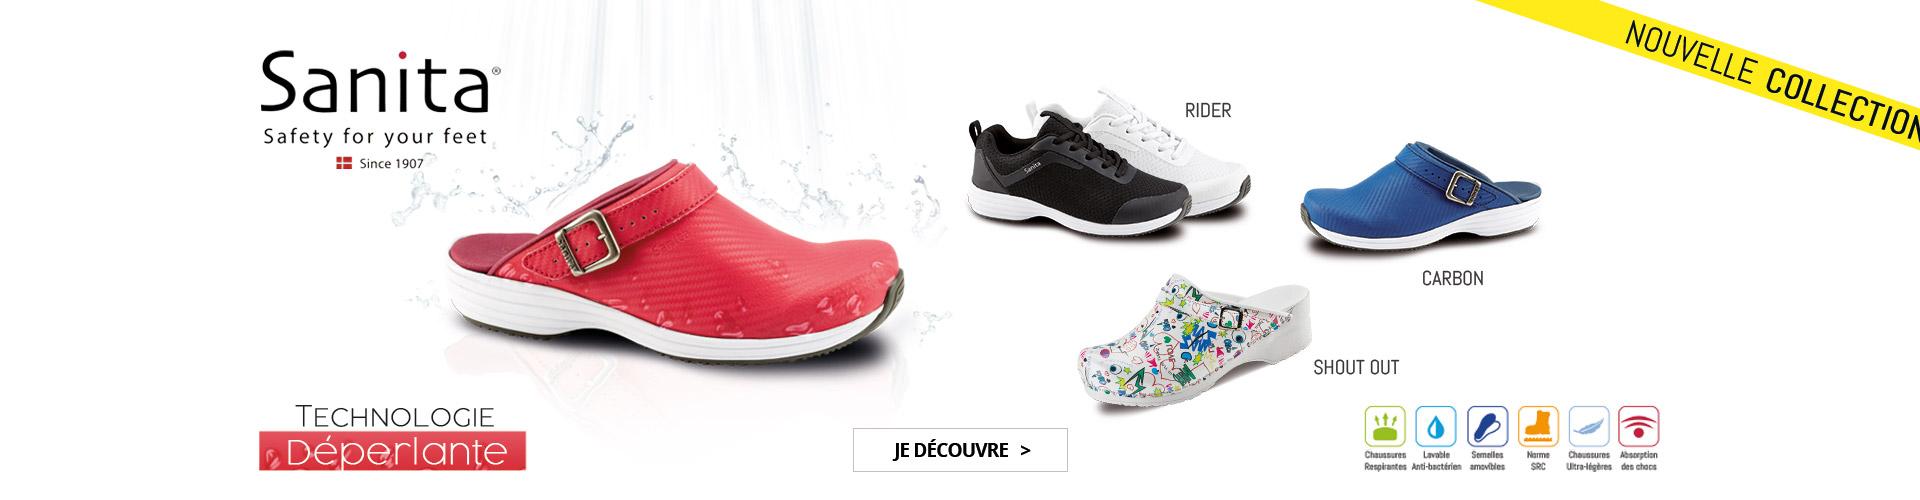 chaussures sanita